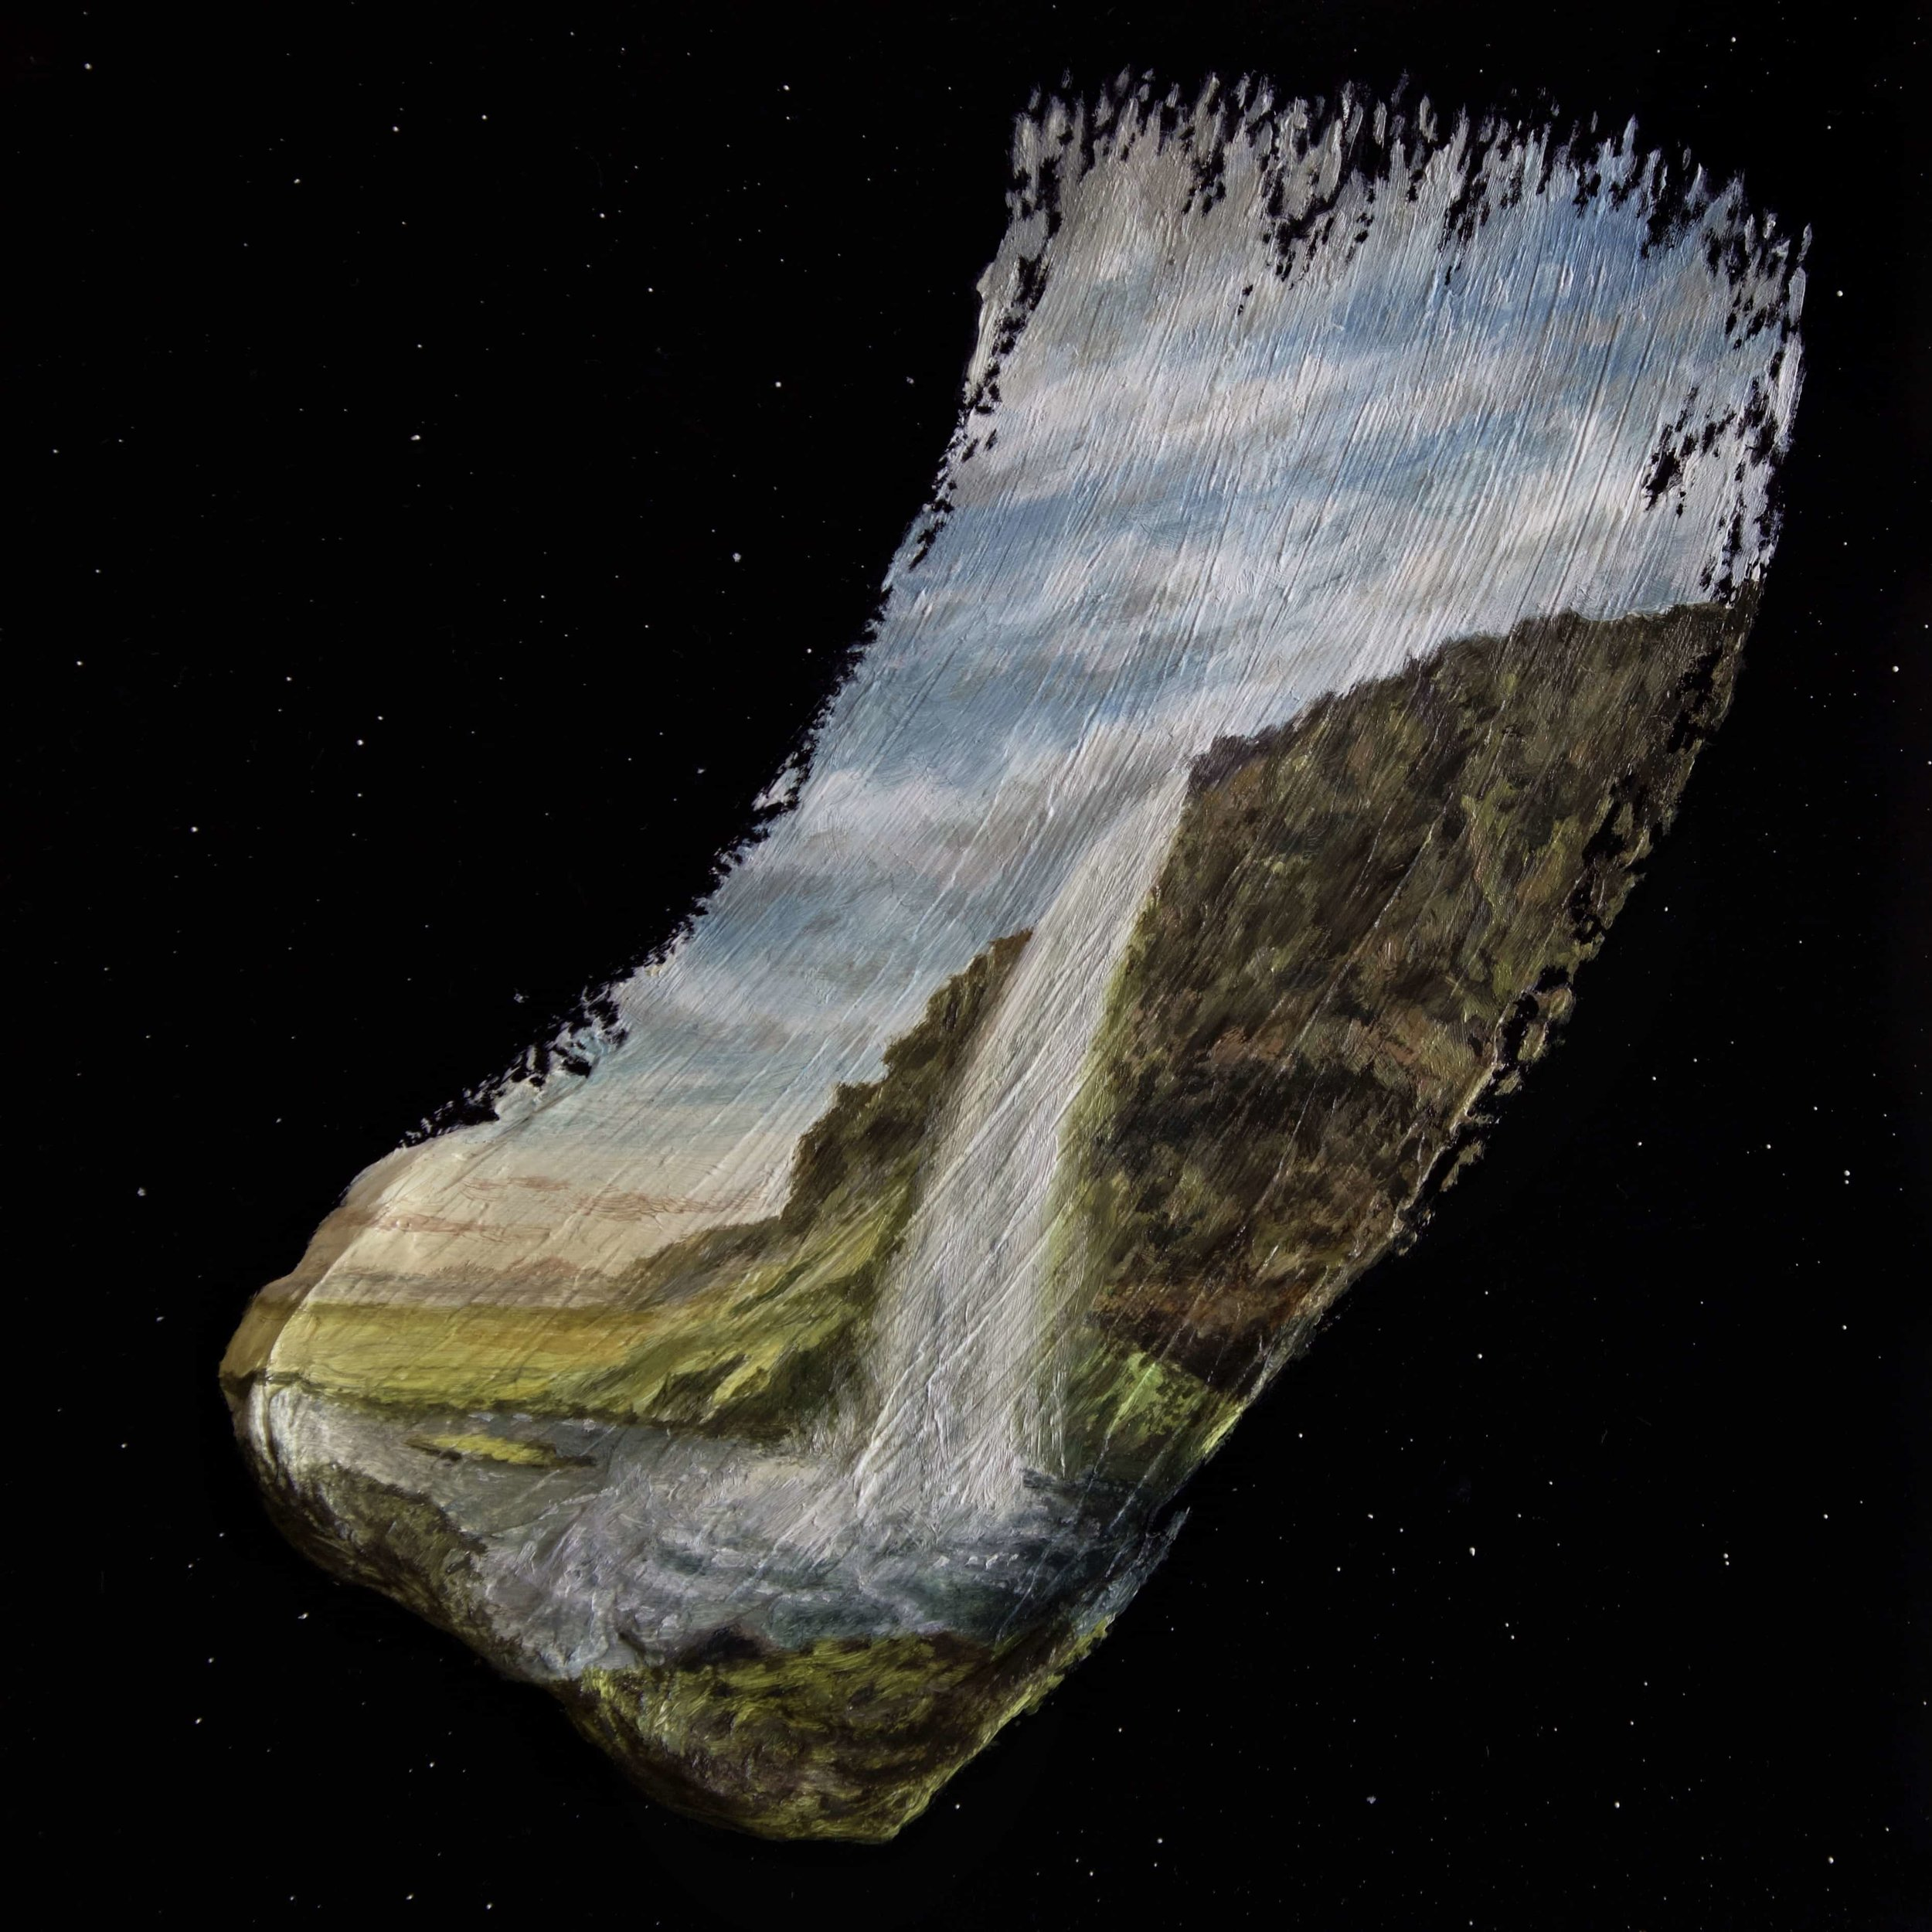 """Seljalandsfoss - Brushstrokes in Time"" oil on 20x20cm mdf panel"